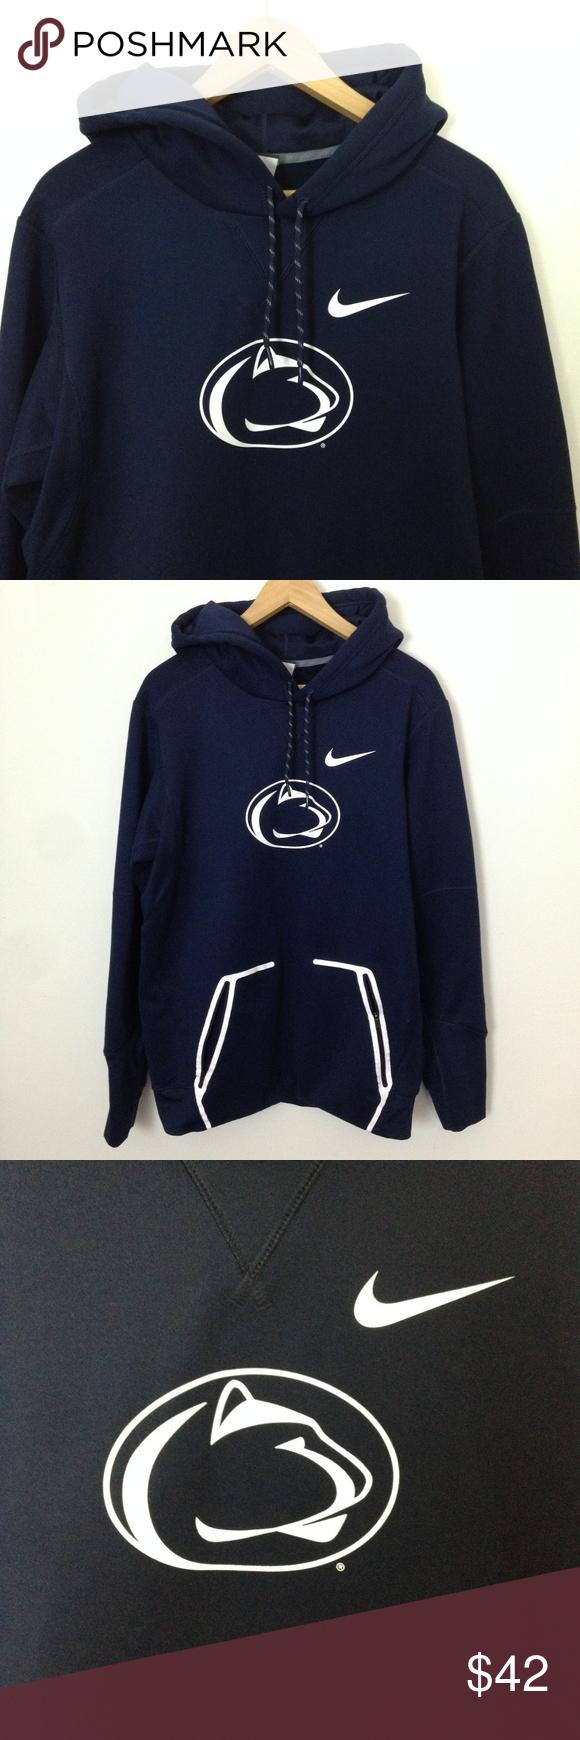 Nike Therma Fit Penn State University S Sweatshirt Sweatshirts Blue And White Hoodies Nike Brand [ 1740 x 580 Pixel ]